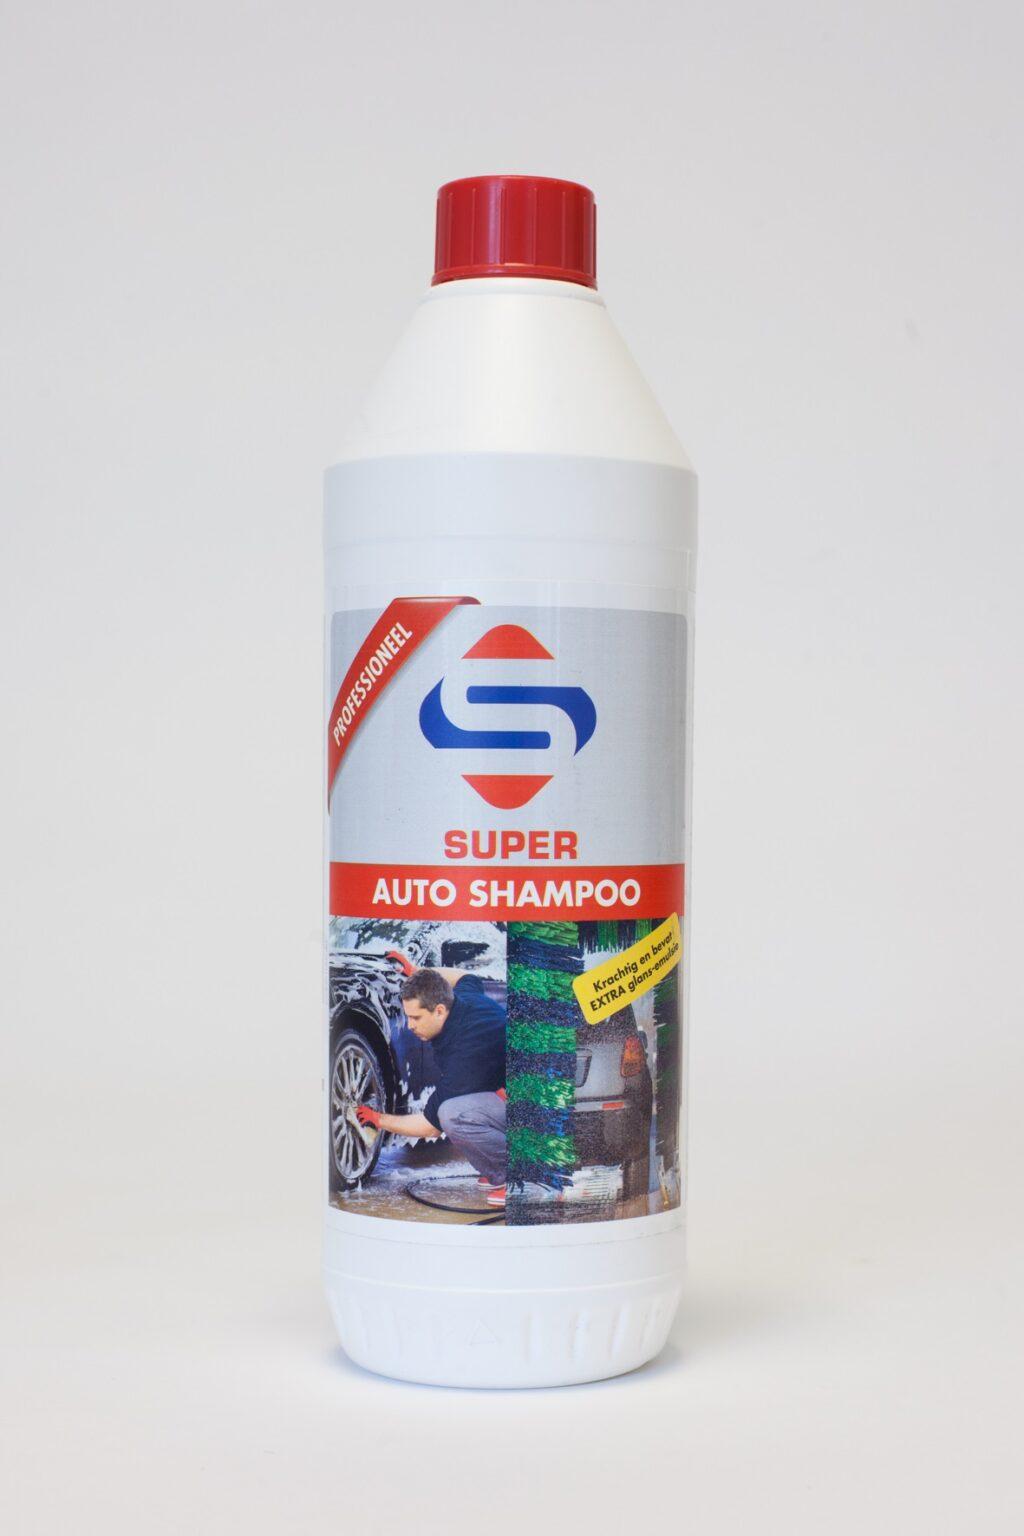 SUPER-Auto-Shampoo-SuperCleaners